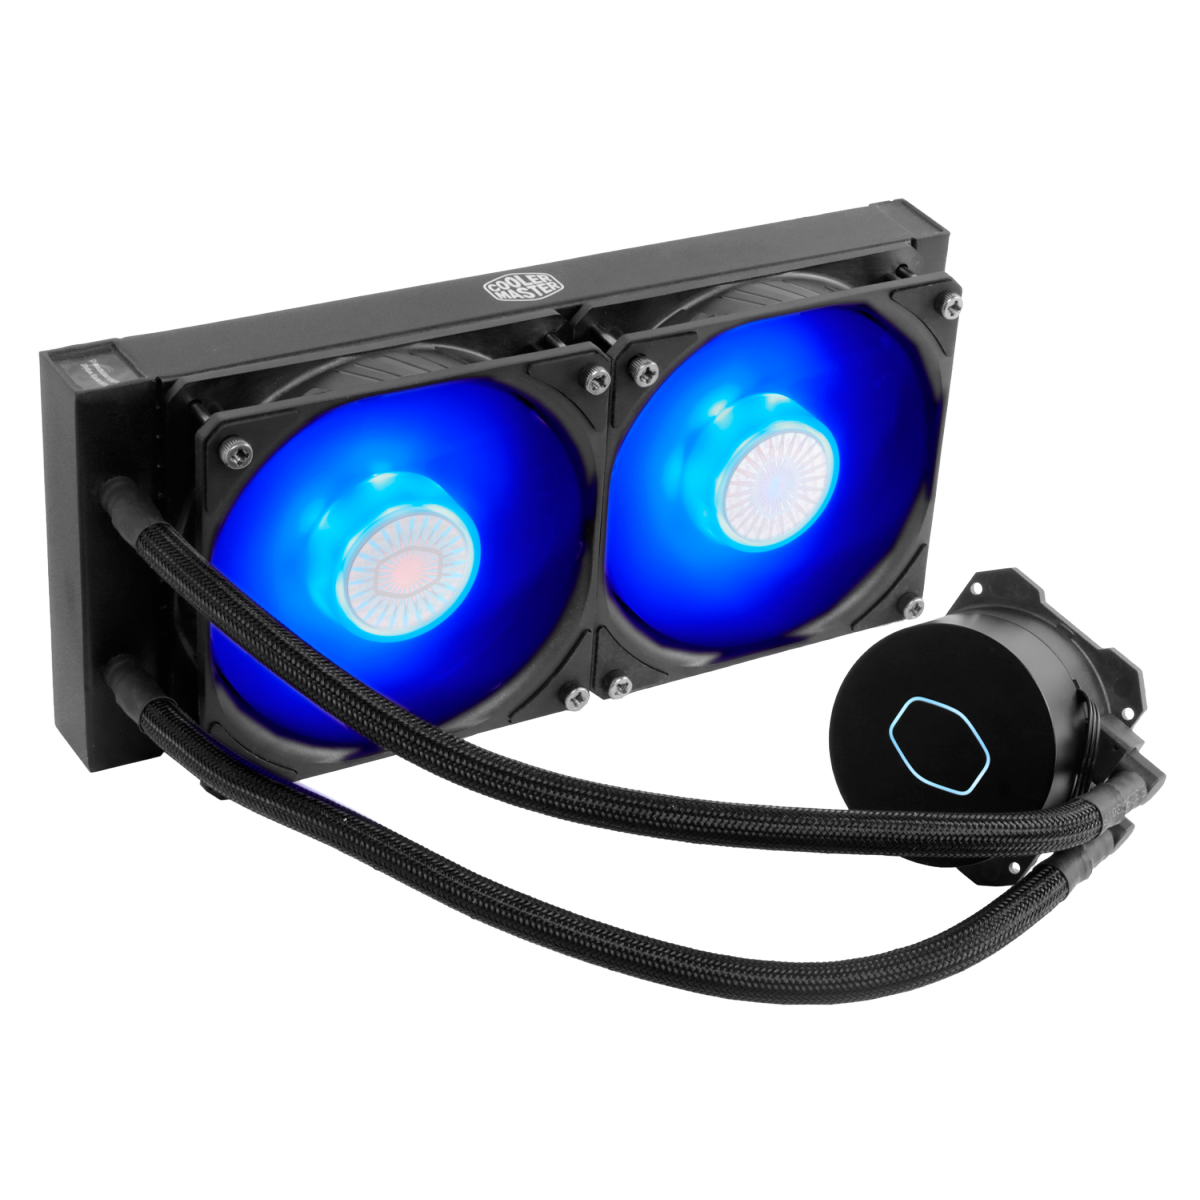 Water Cooler Cooler Master Masterliquid ML240L V2 Blue, 240mm, Intel-AMD, MLW-D24M-A18PB-R2